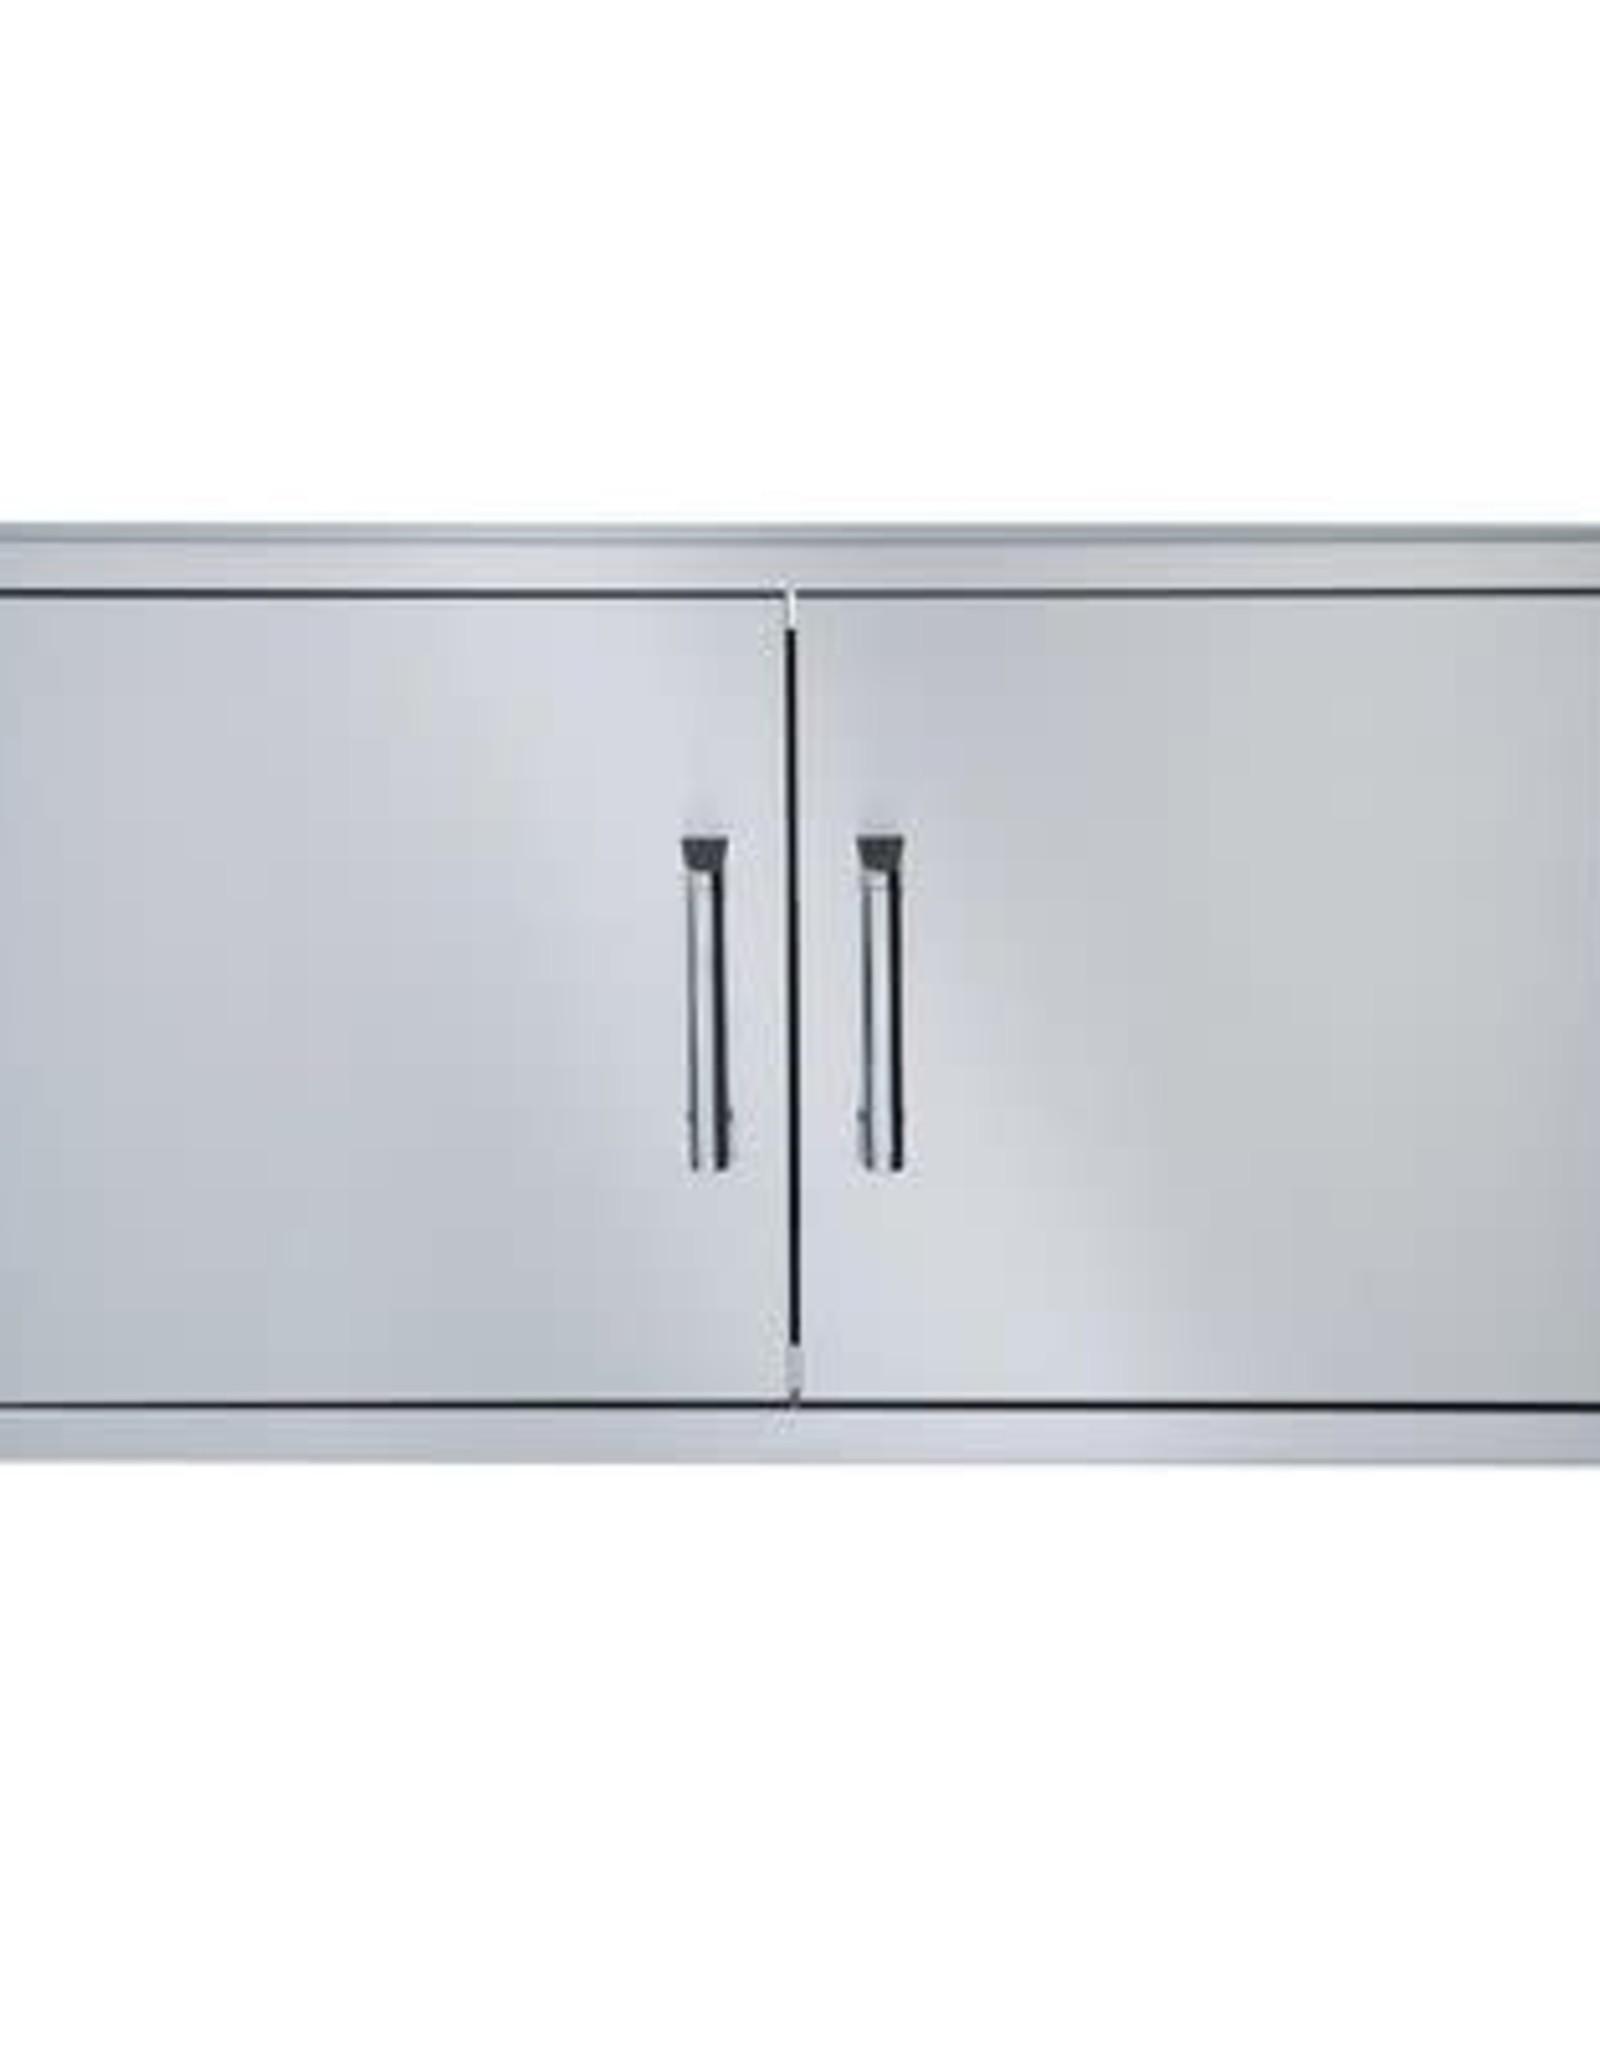 Broilmaster Broilmaster 42-Inch Double Door for BSG424N Gas Grill - BSAD4222D